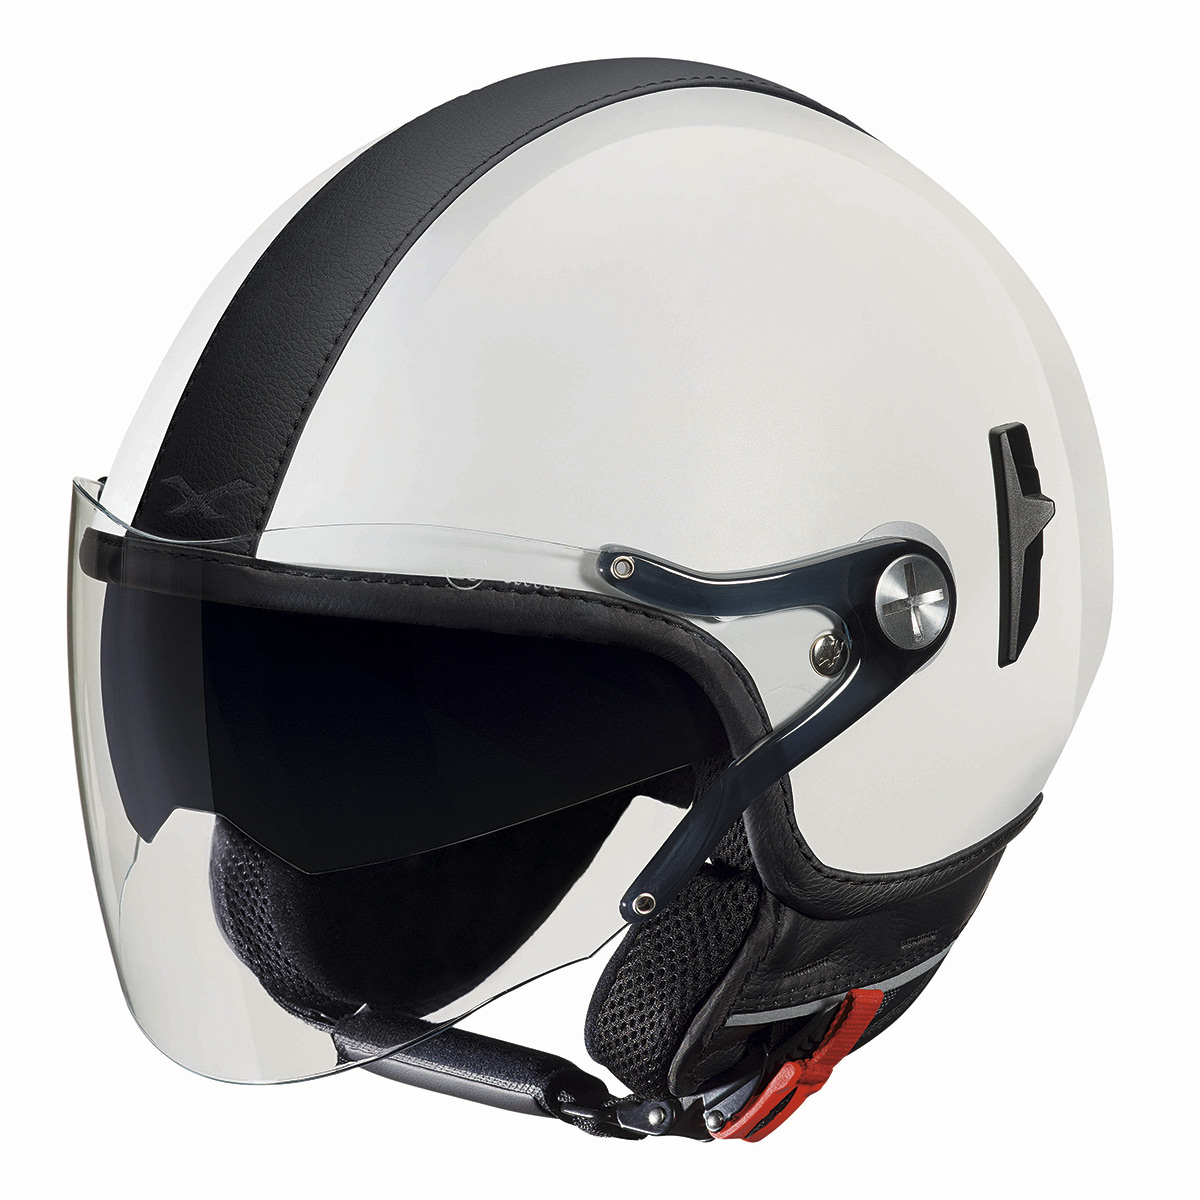 Capacete Nexx X60 Cruise White/Black NOVO!  - Nova Suzuki Motos e Acessórios